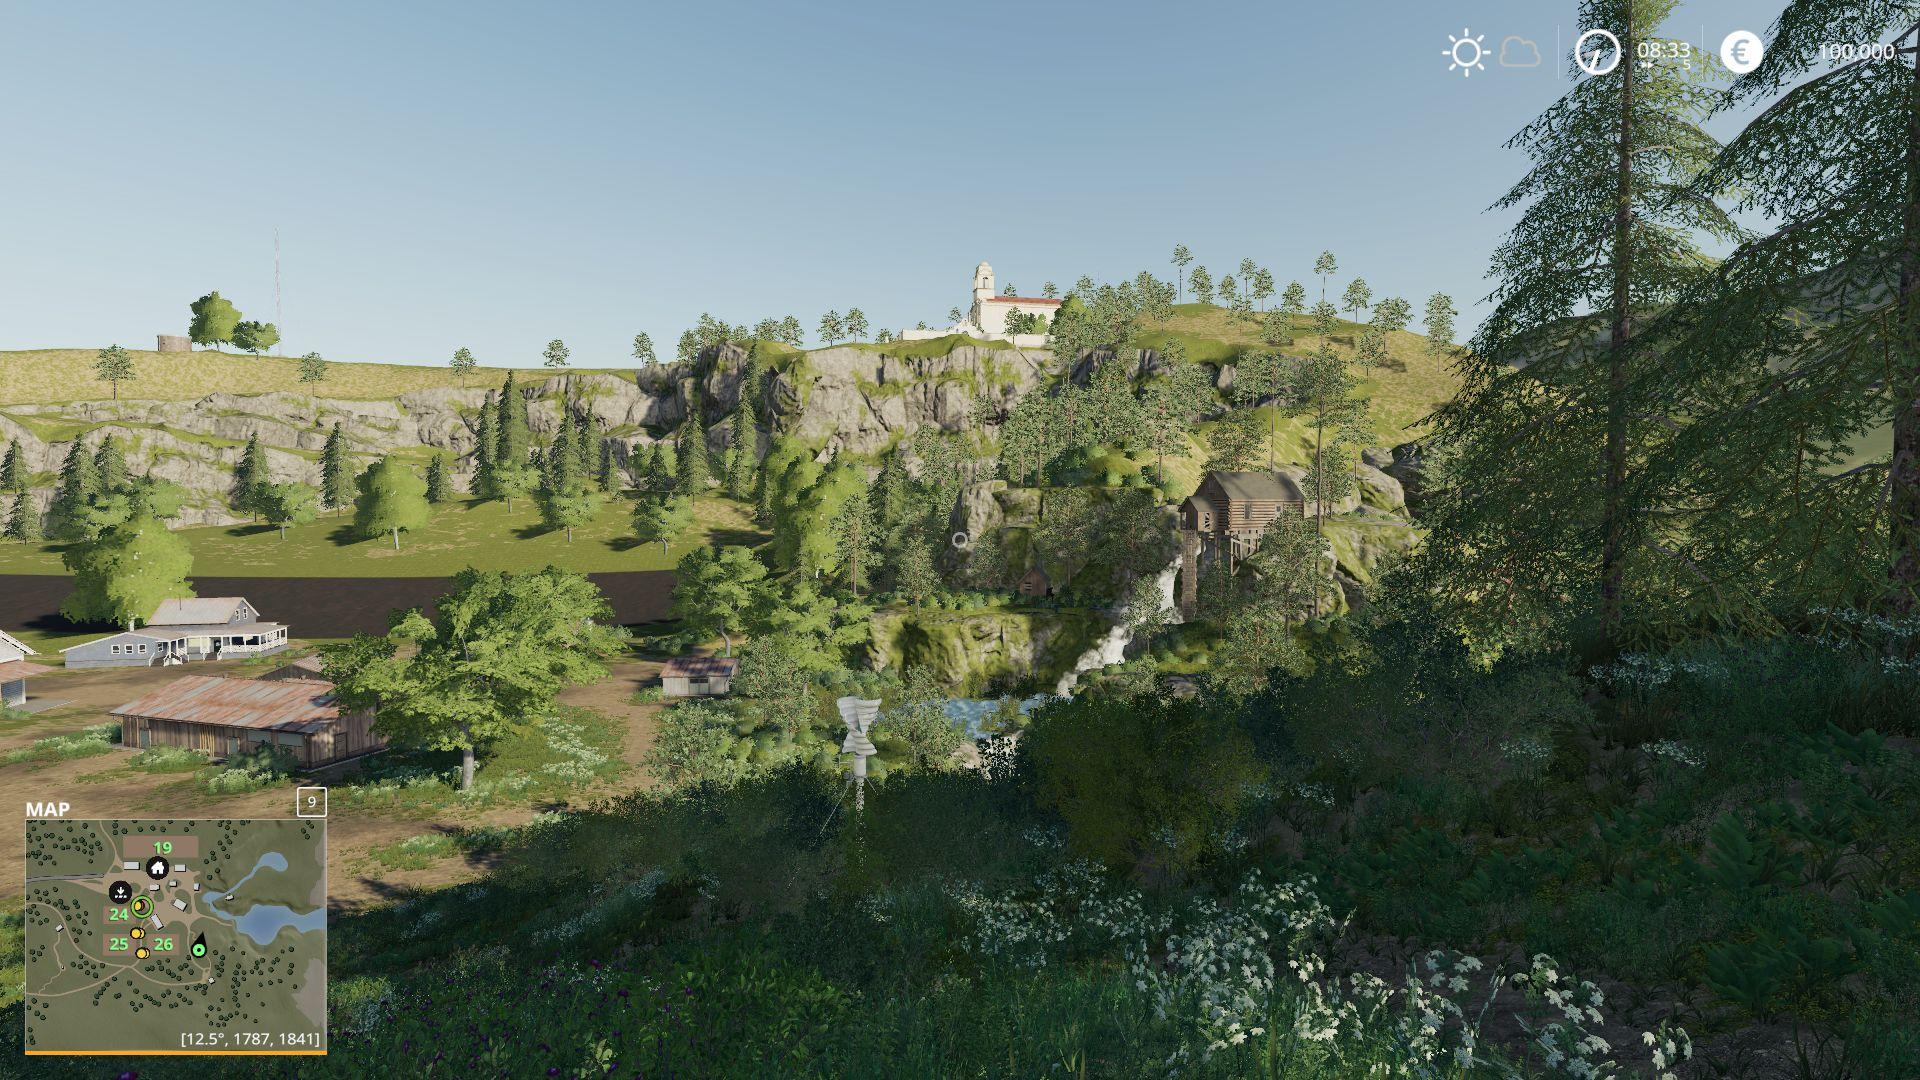 Farming simulator 2015 update 12 codex